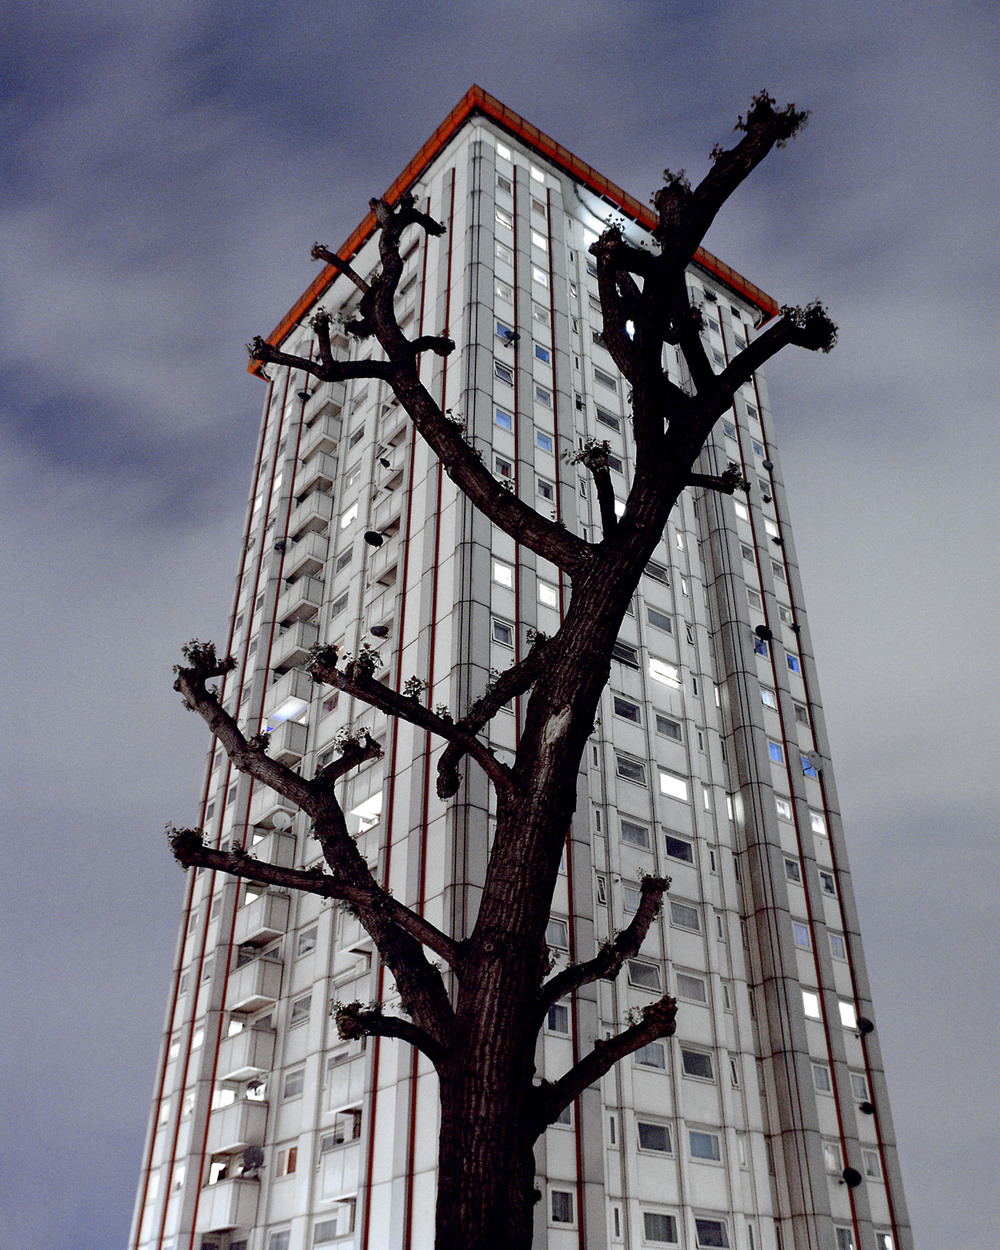 Tree & Tower mornington cresent 001 copy.jpg